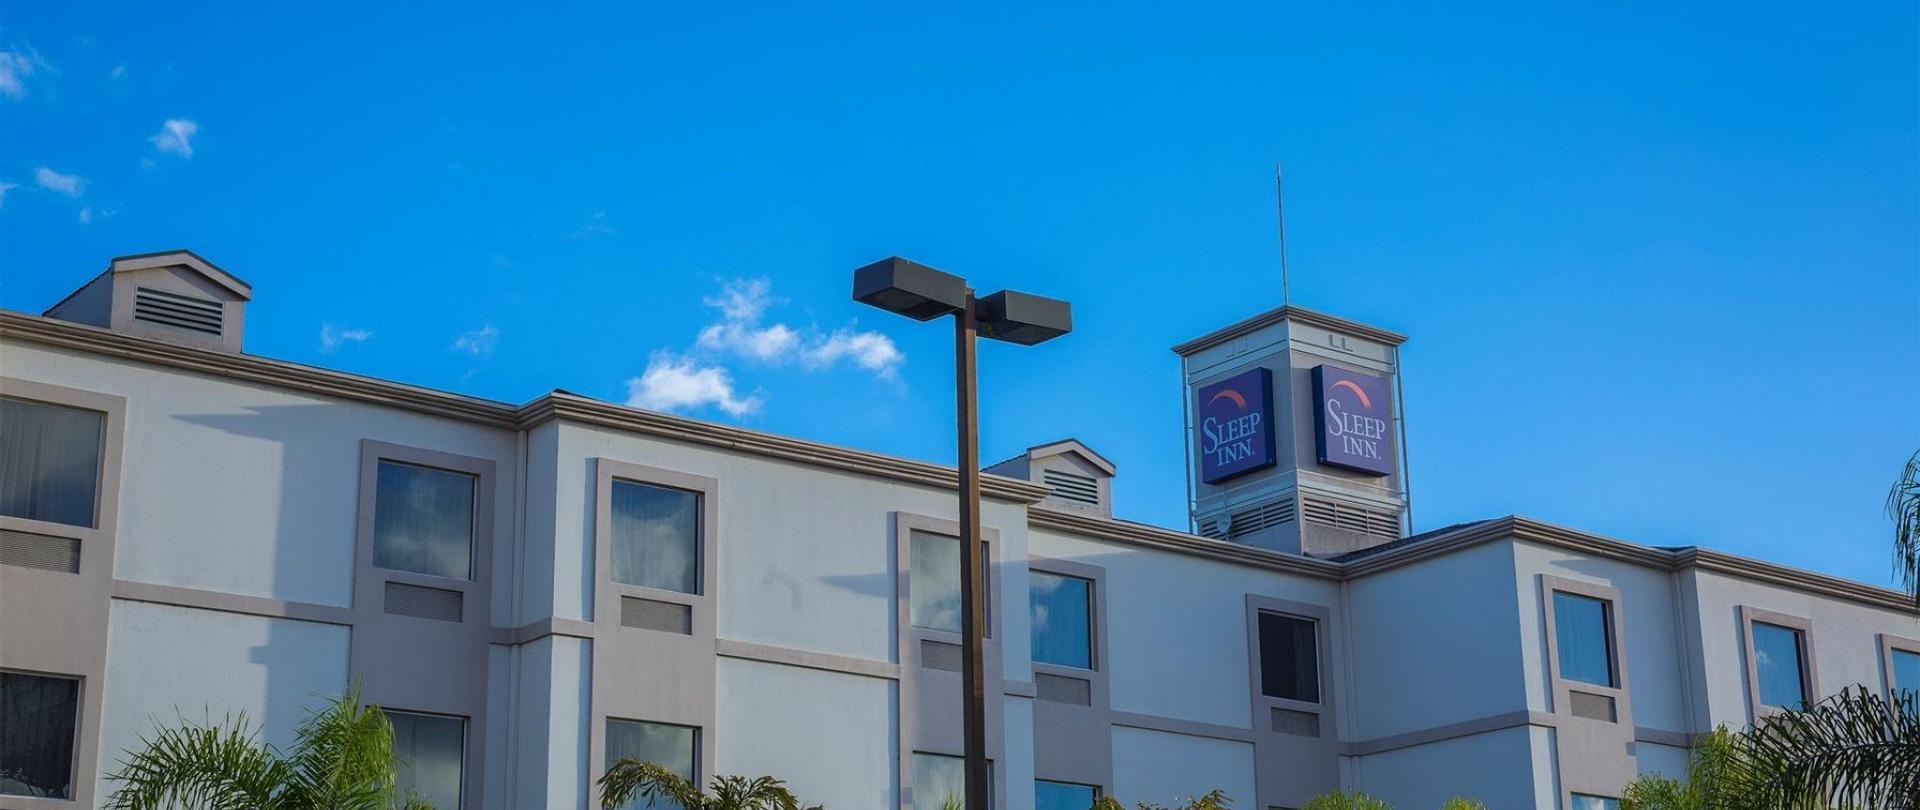 Hotel Sleep Inn Paseo Las Damas2.jpg